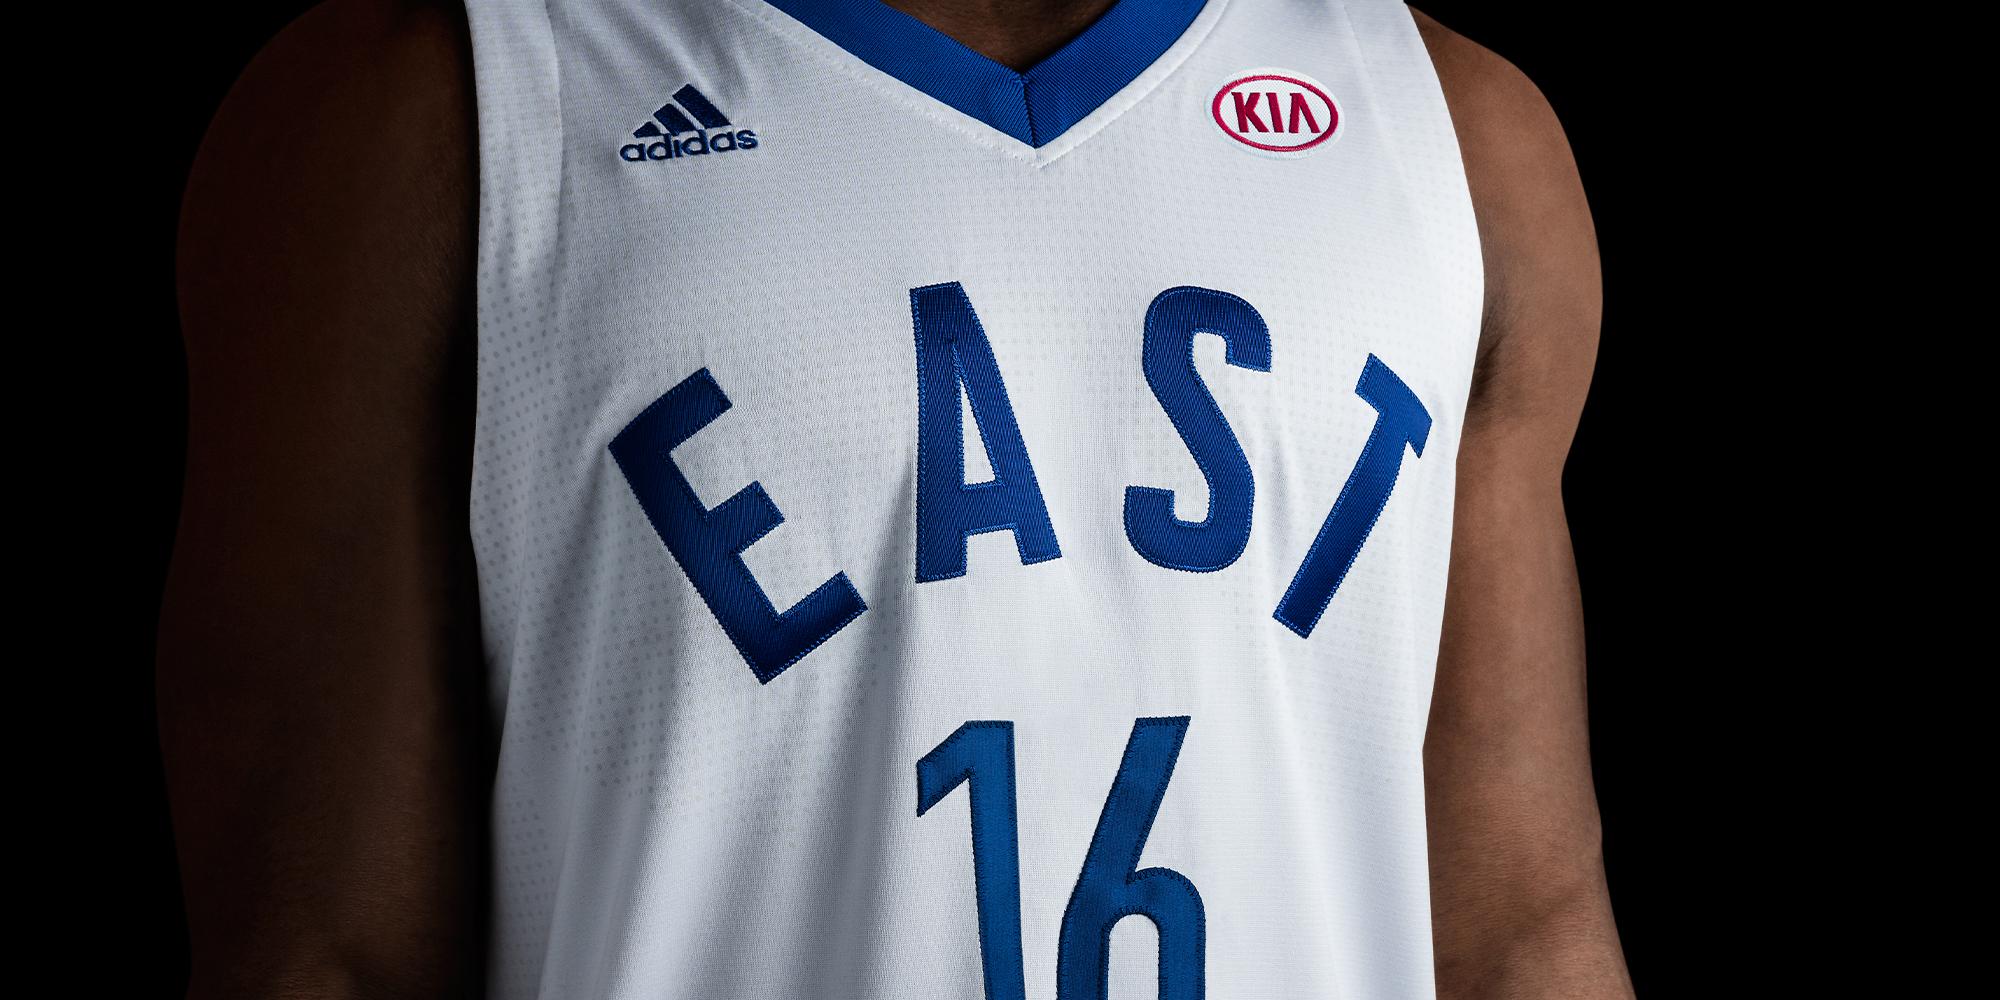 Kia adidas NBA All Star game 2016 toronto East Jersey Kia sponsor